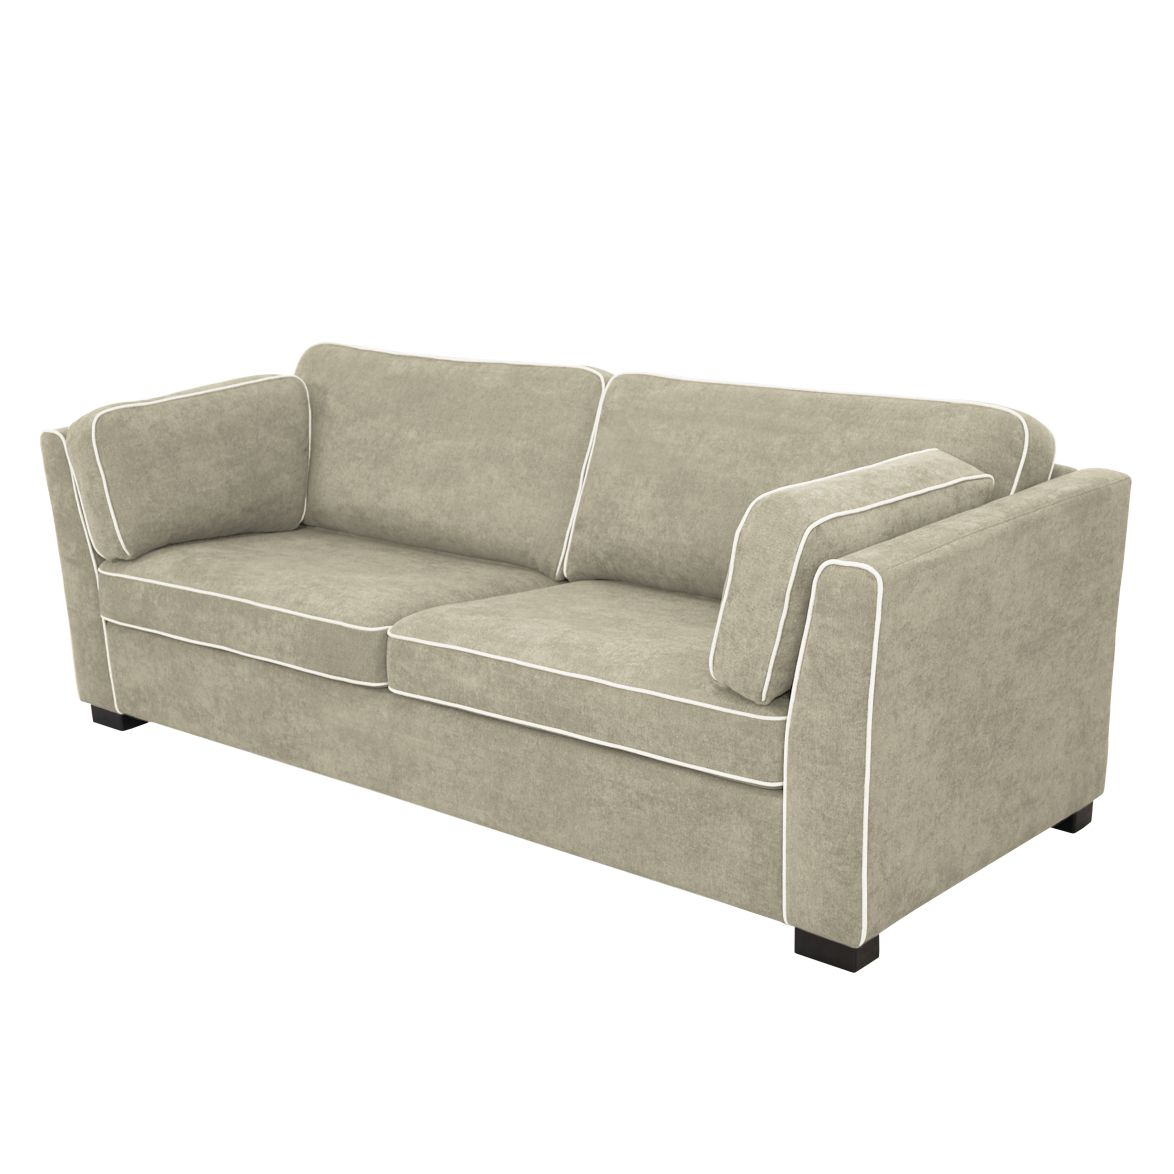 sofa margus 3 sitzer webstoff cappuccino nuovoform. Black Bedroom Furniture Sets. Home Design Ideas